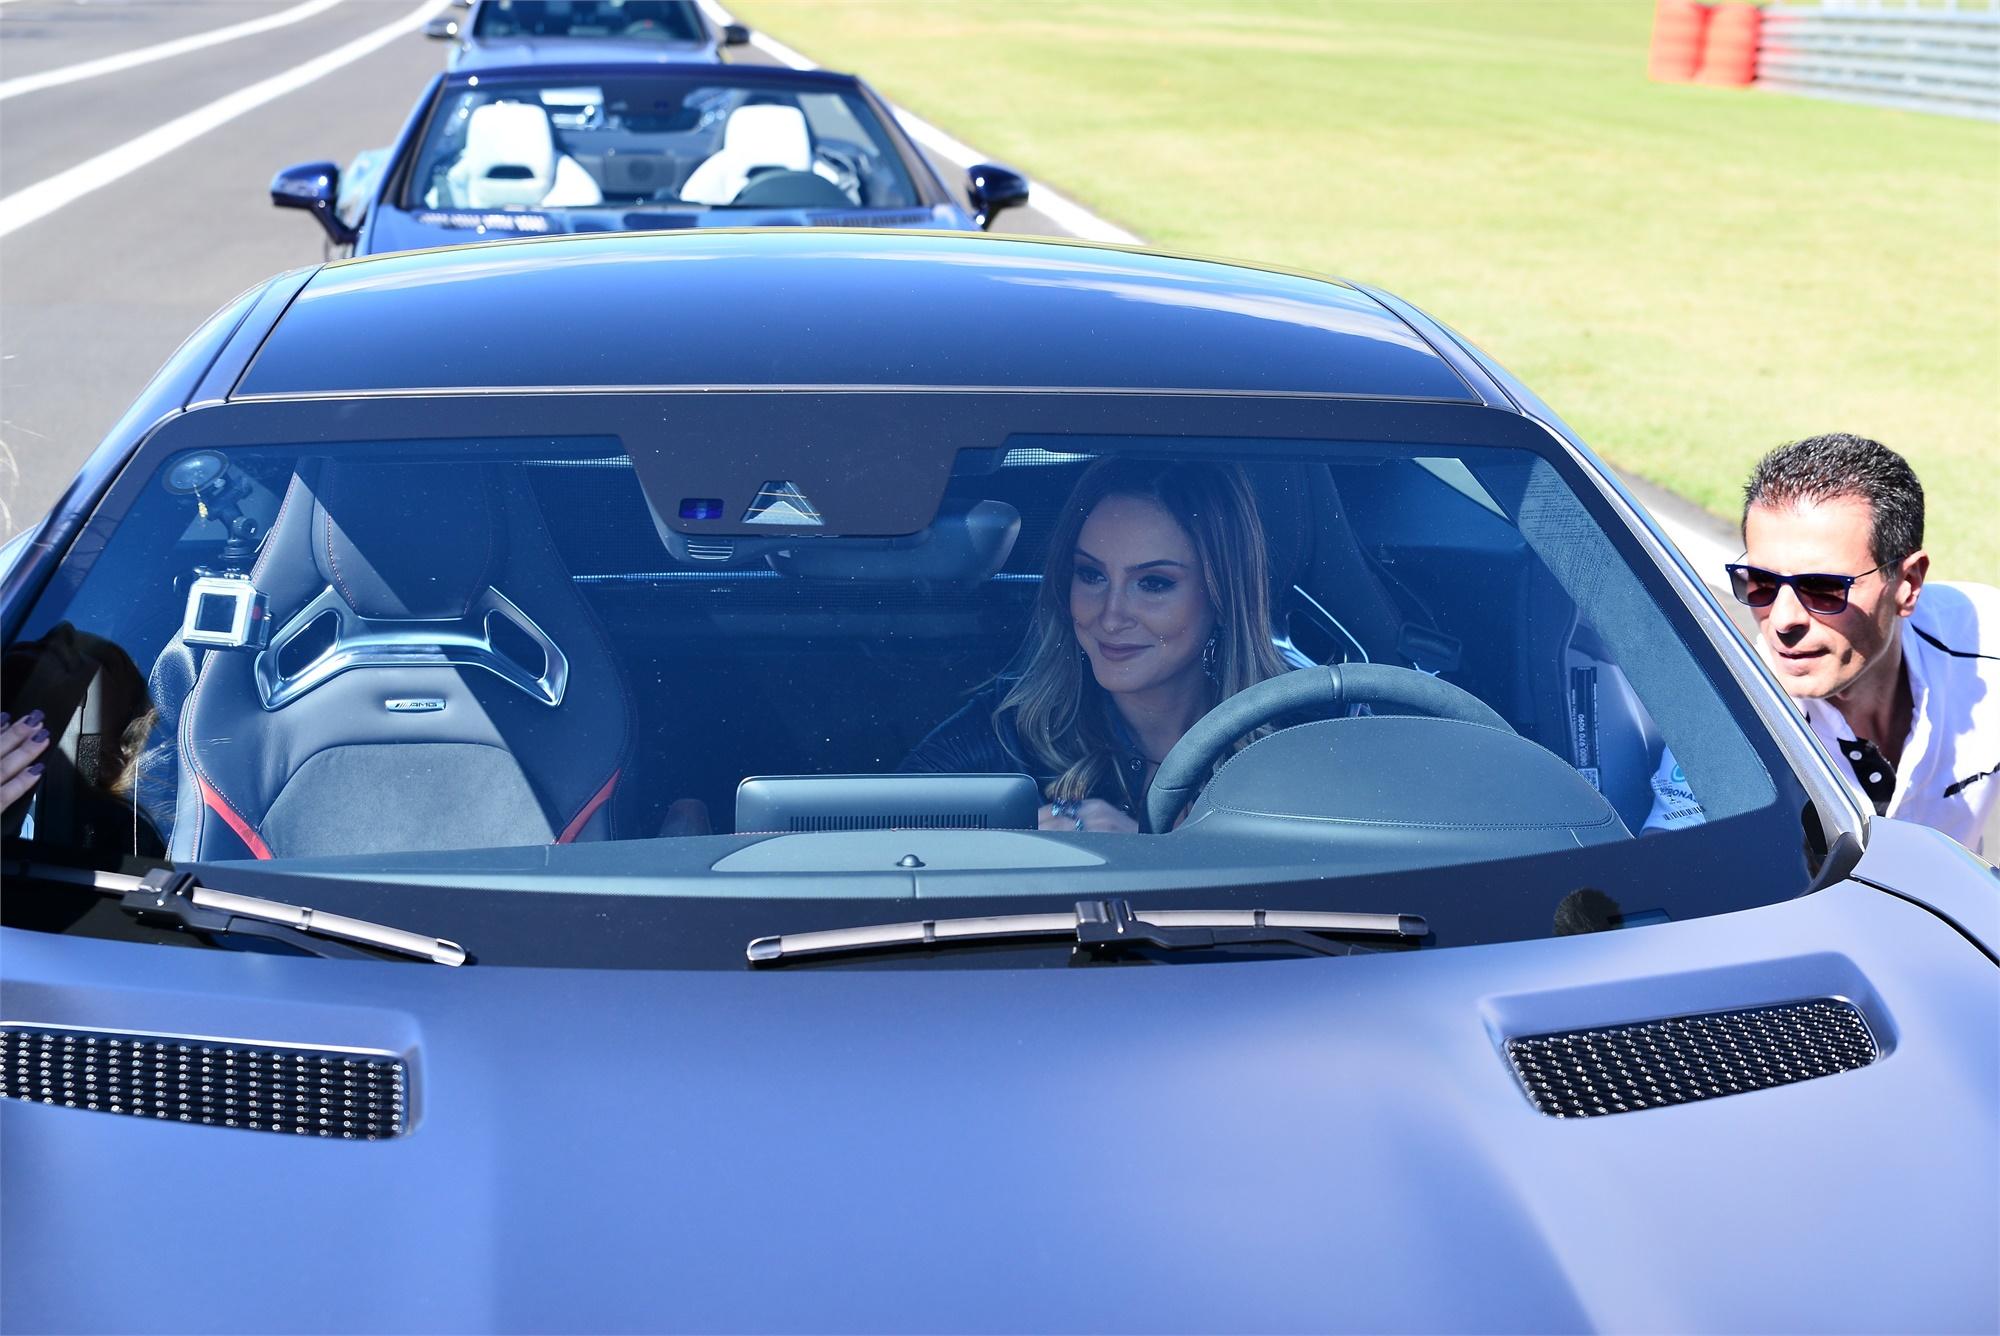 Mercedes-AMG promove dia de pista exclusivo para mulheres B47zsF